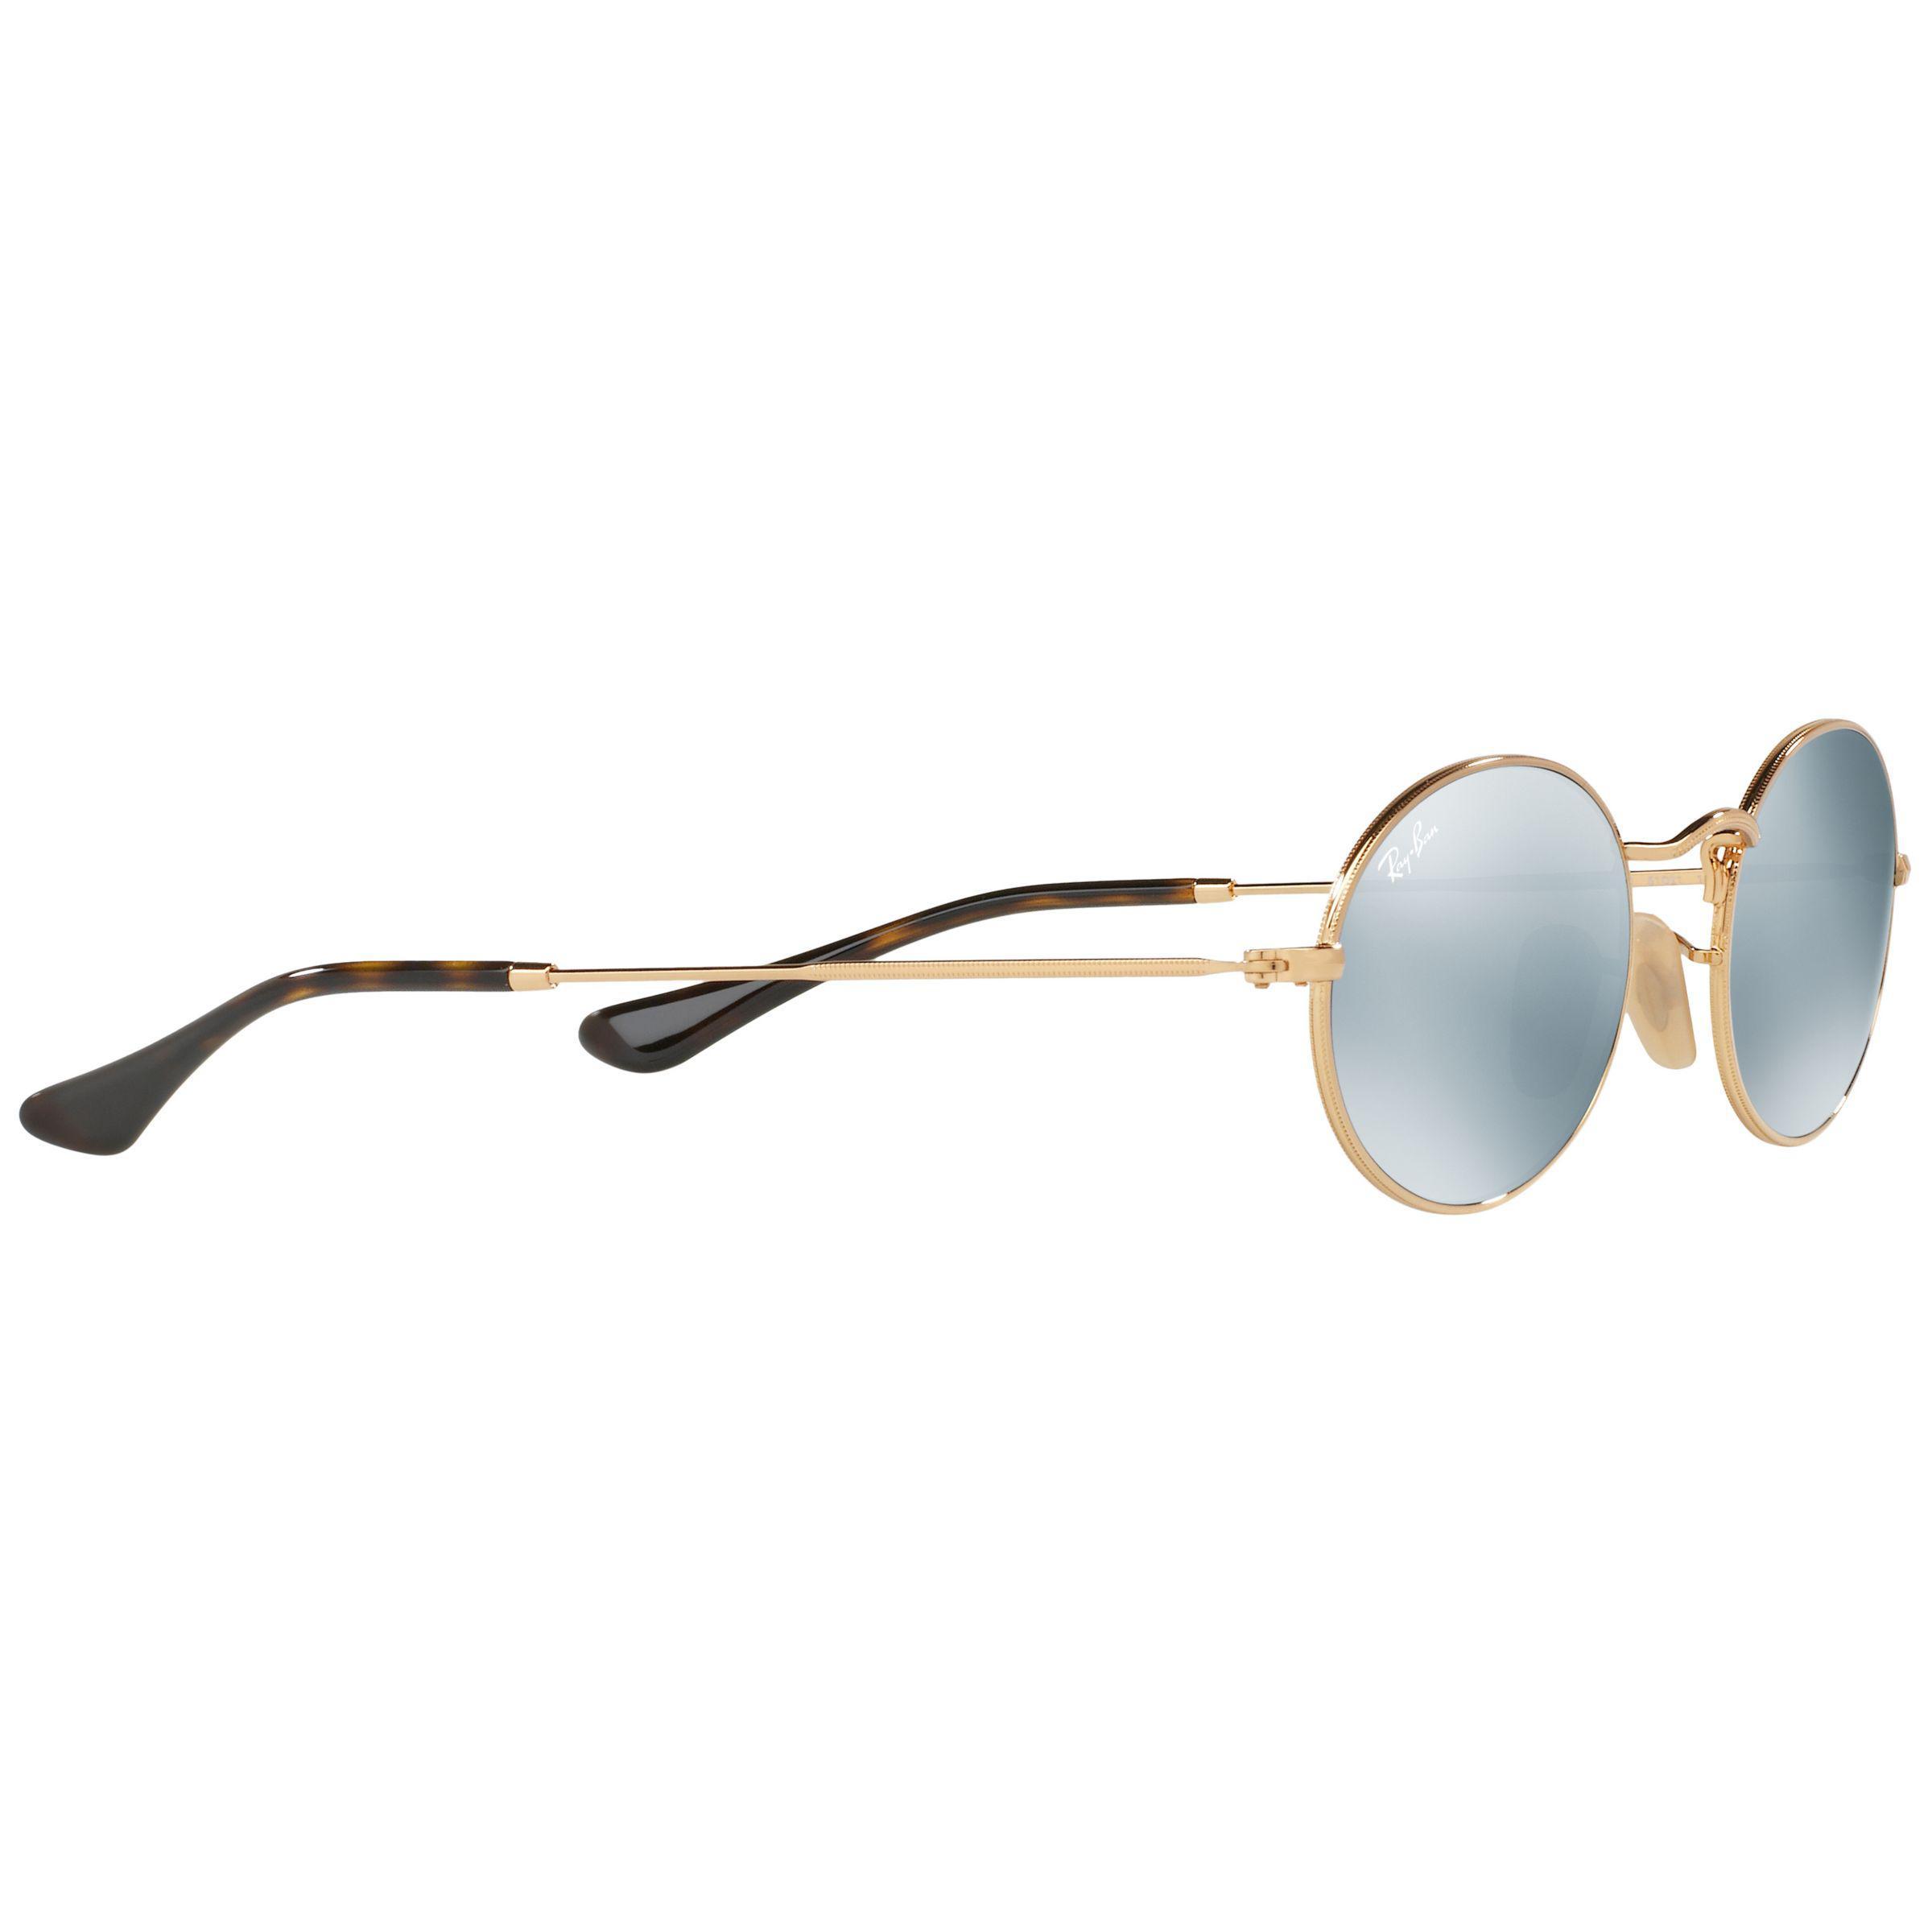 dc34adb75b Ray-Ban - White Rb3547 Oval Flat Lens Sunglasses - Lyst. View fullscreen